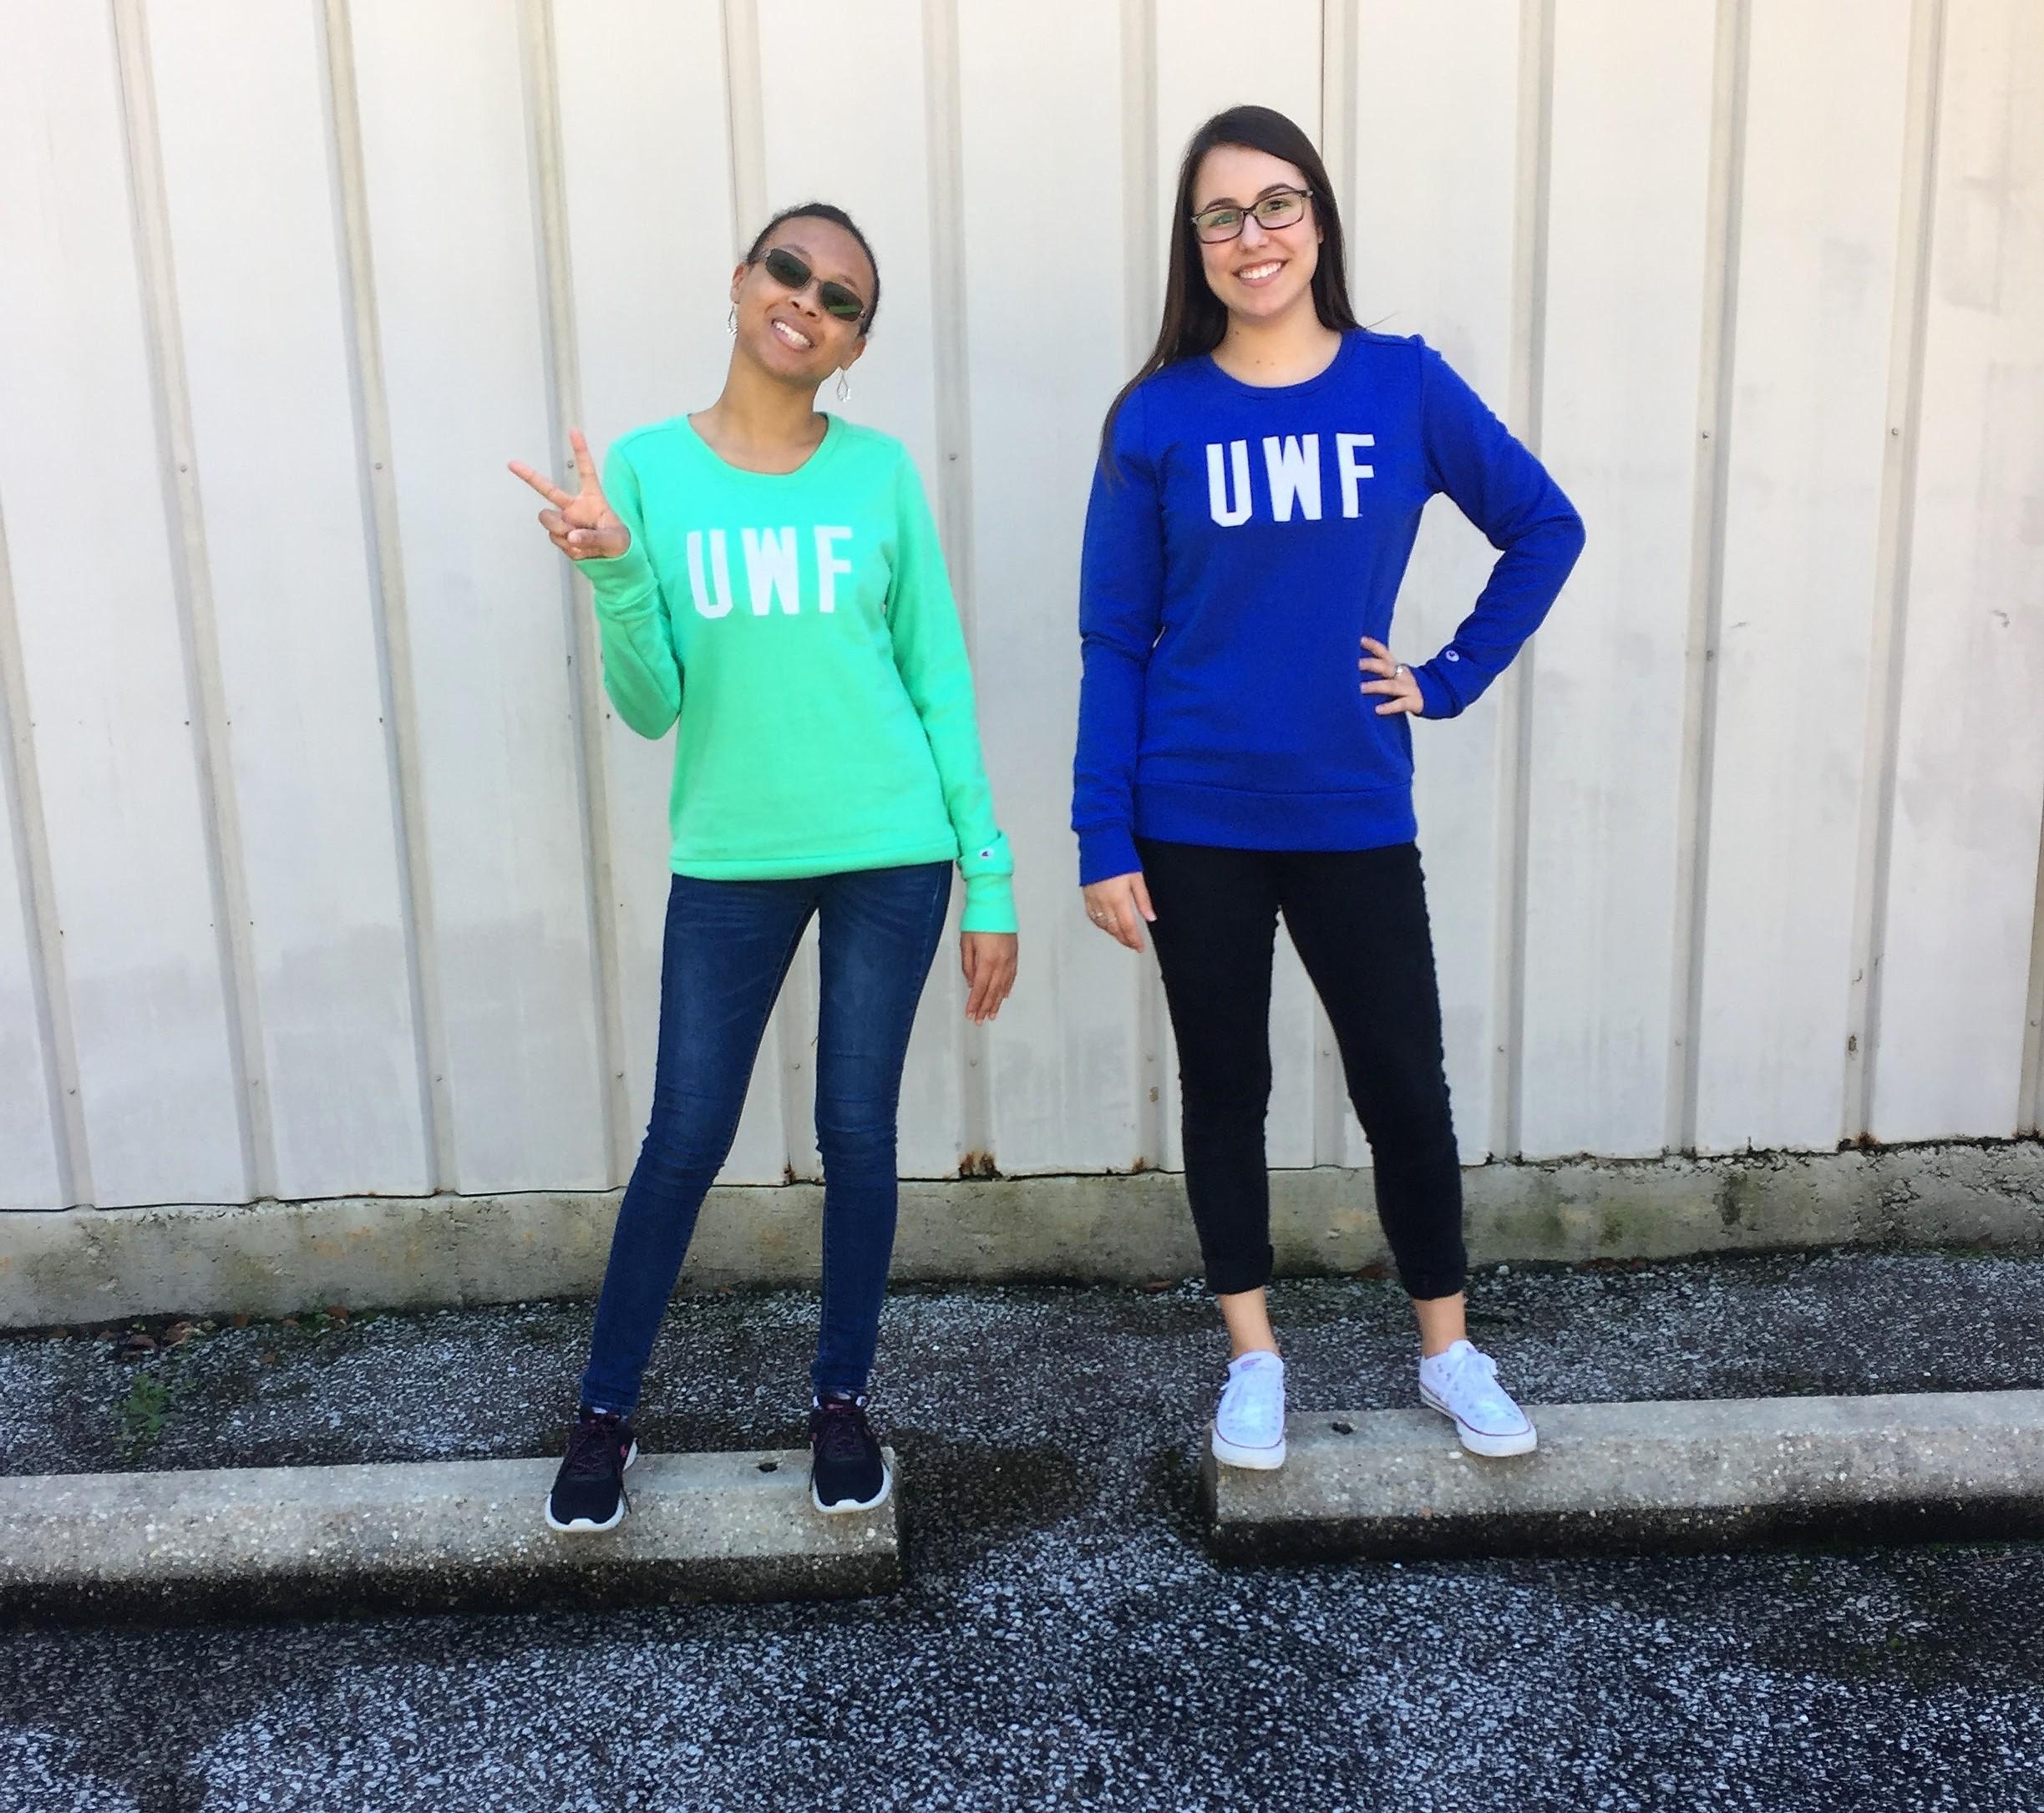 UWF CREW SWEATSHIRT